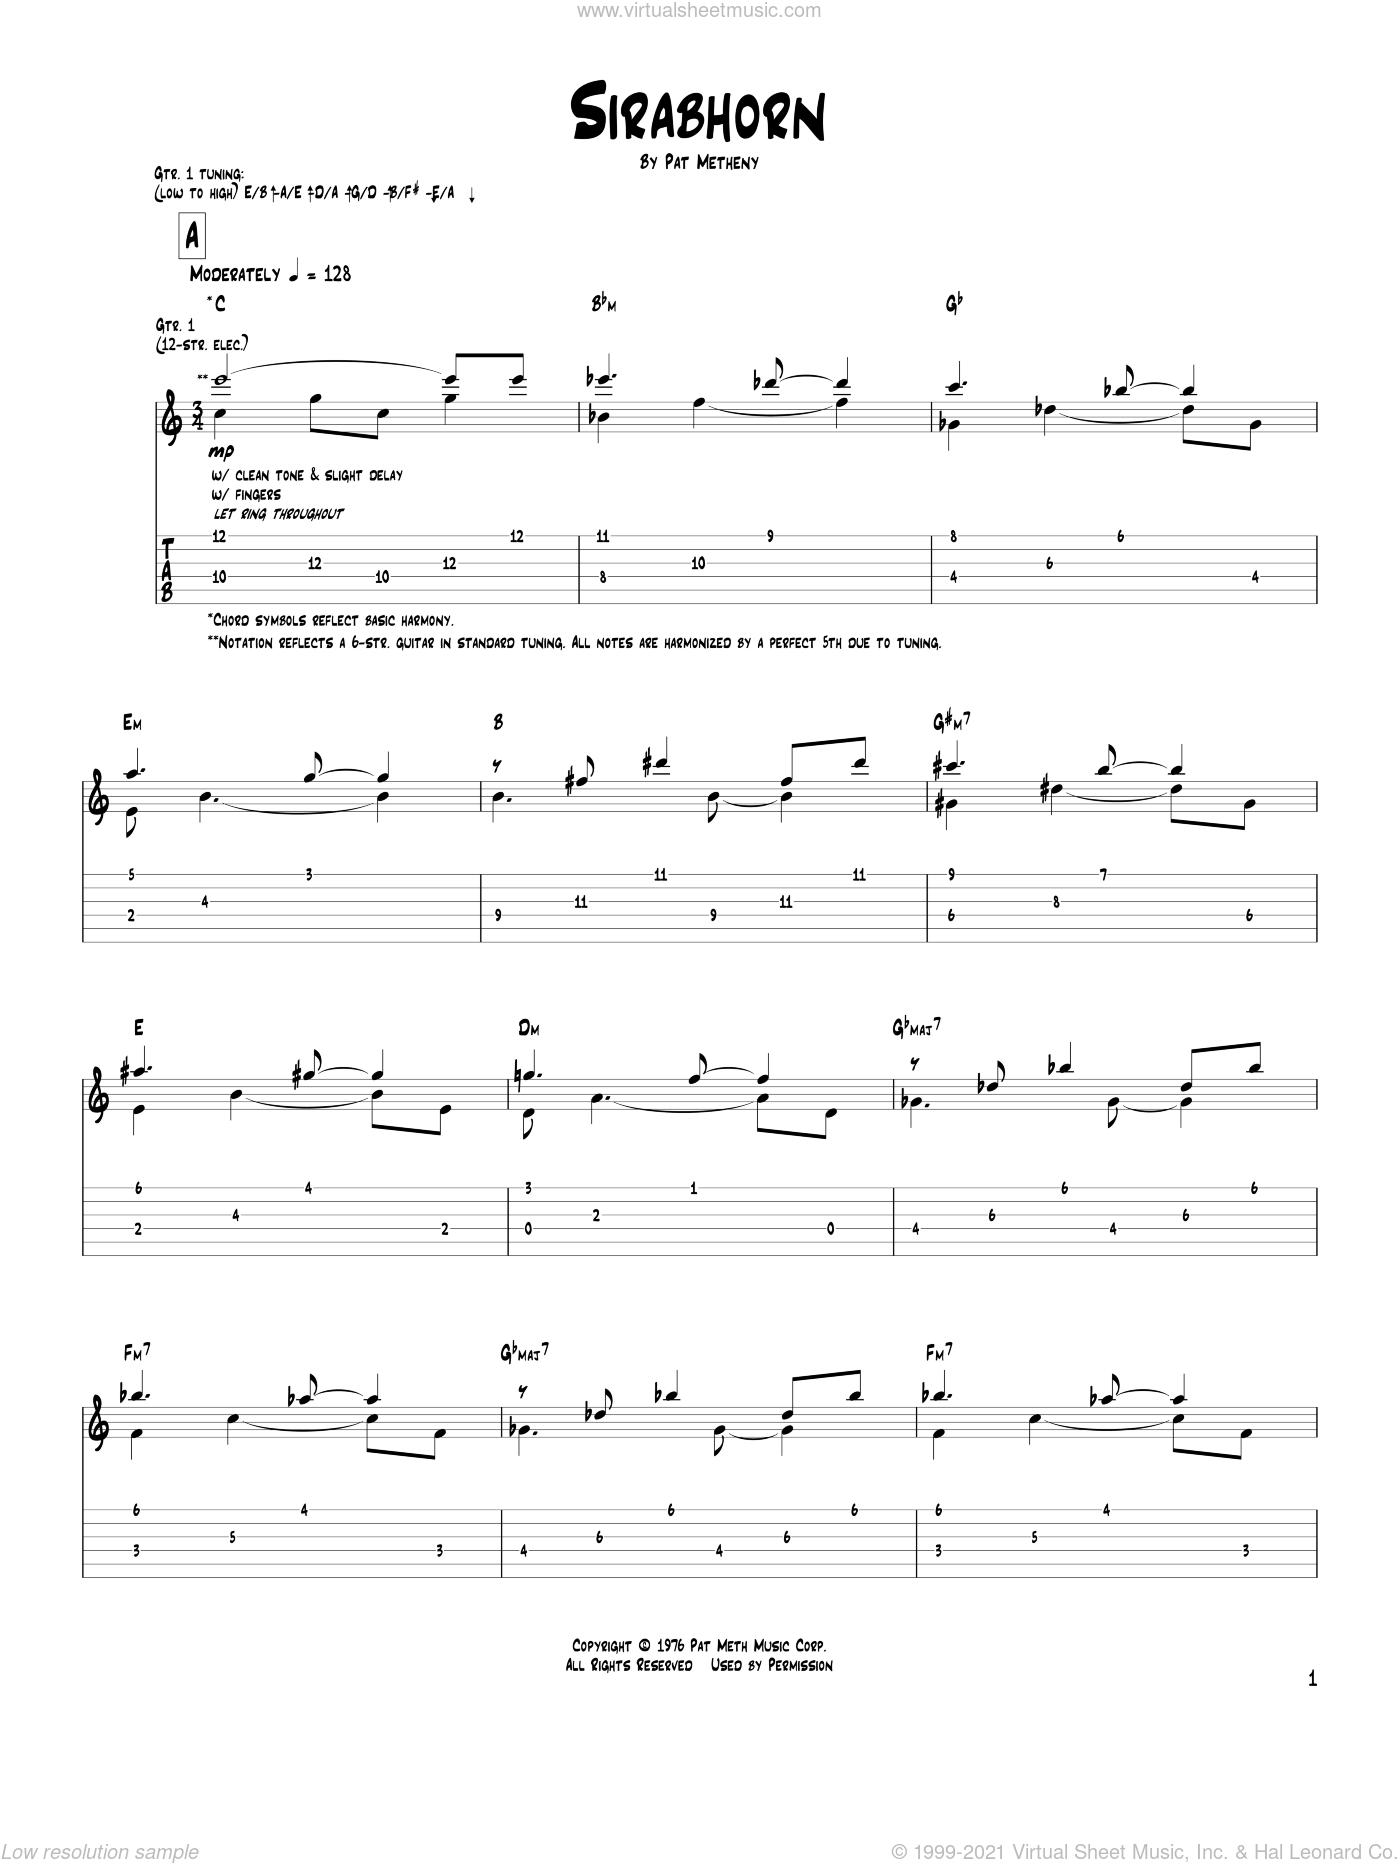 Sirabhorn sheet music for guitar (tablature) by Pat Metheny, intermediate skill level